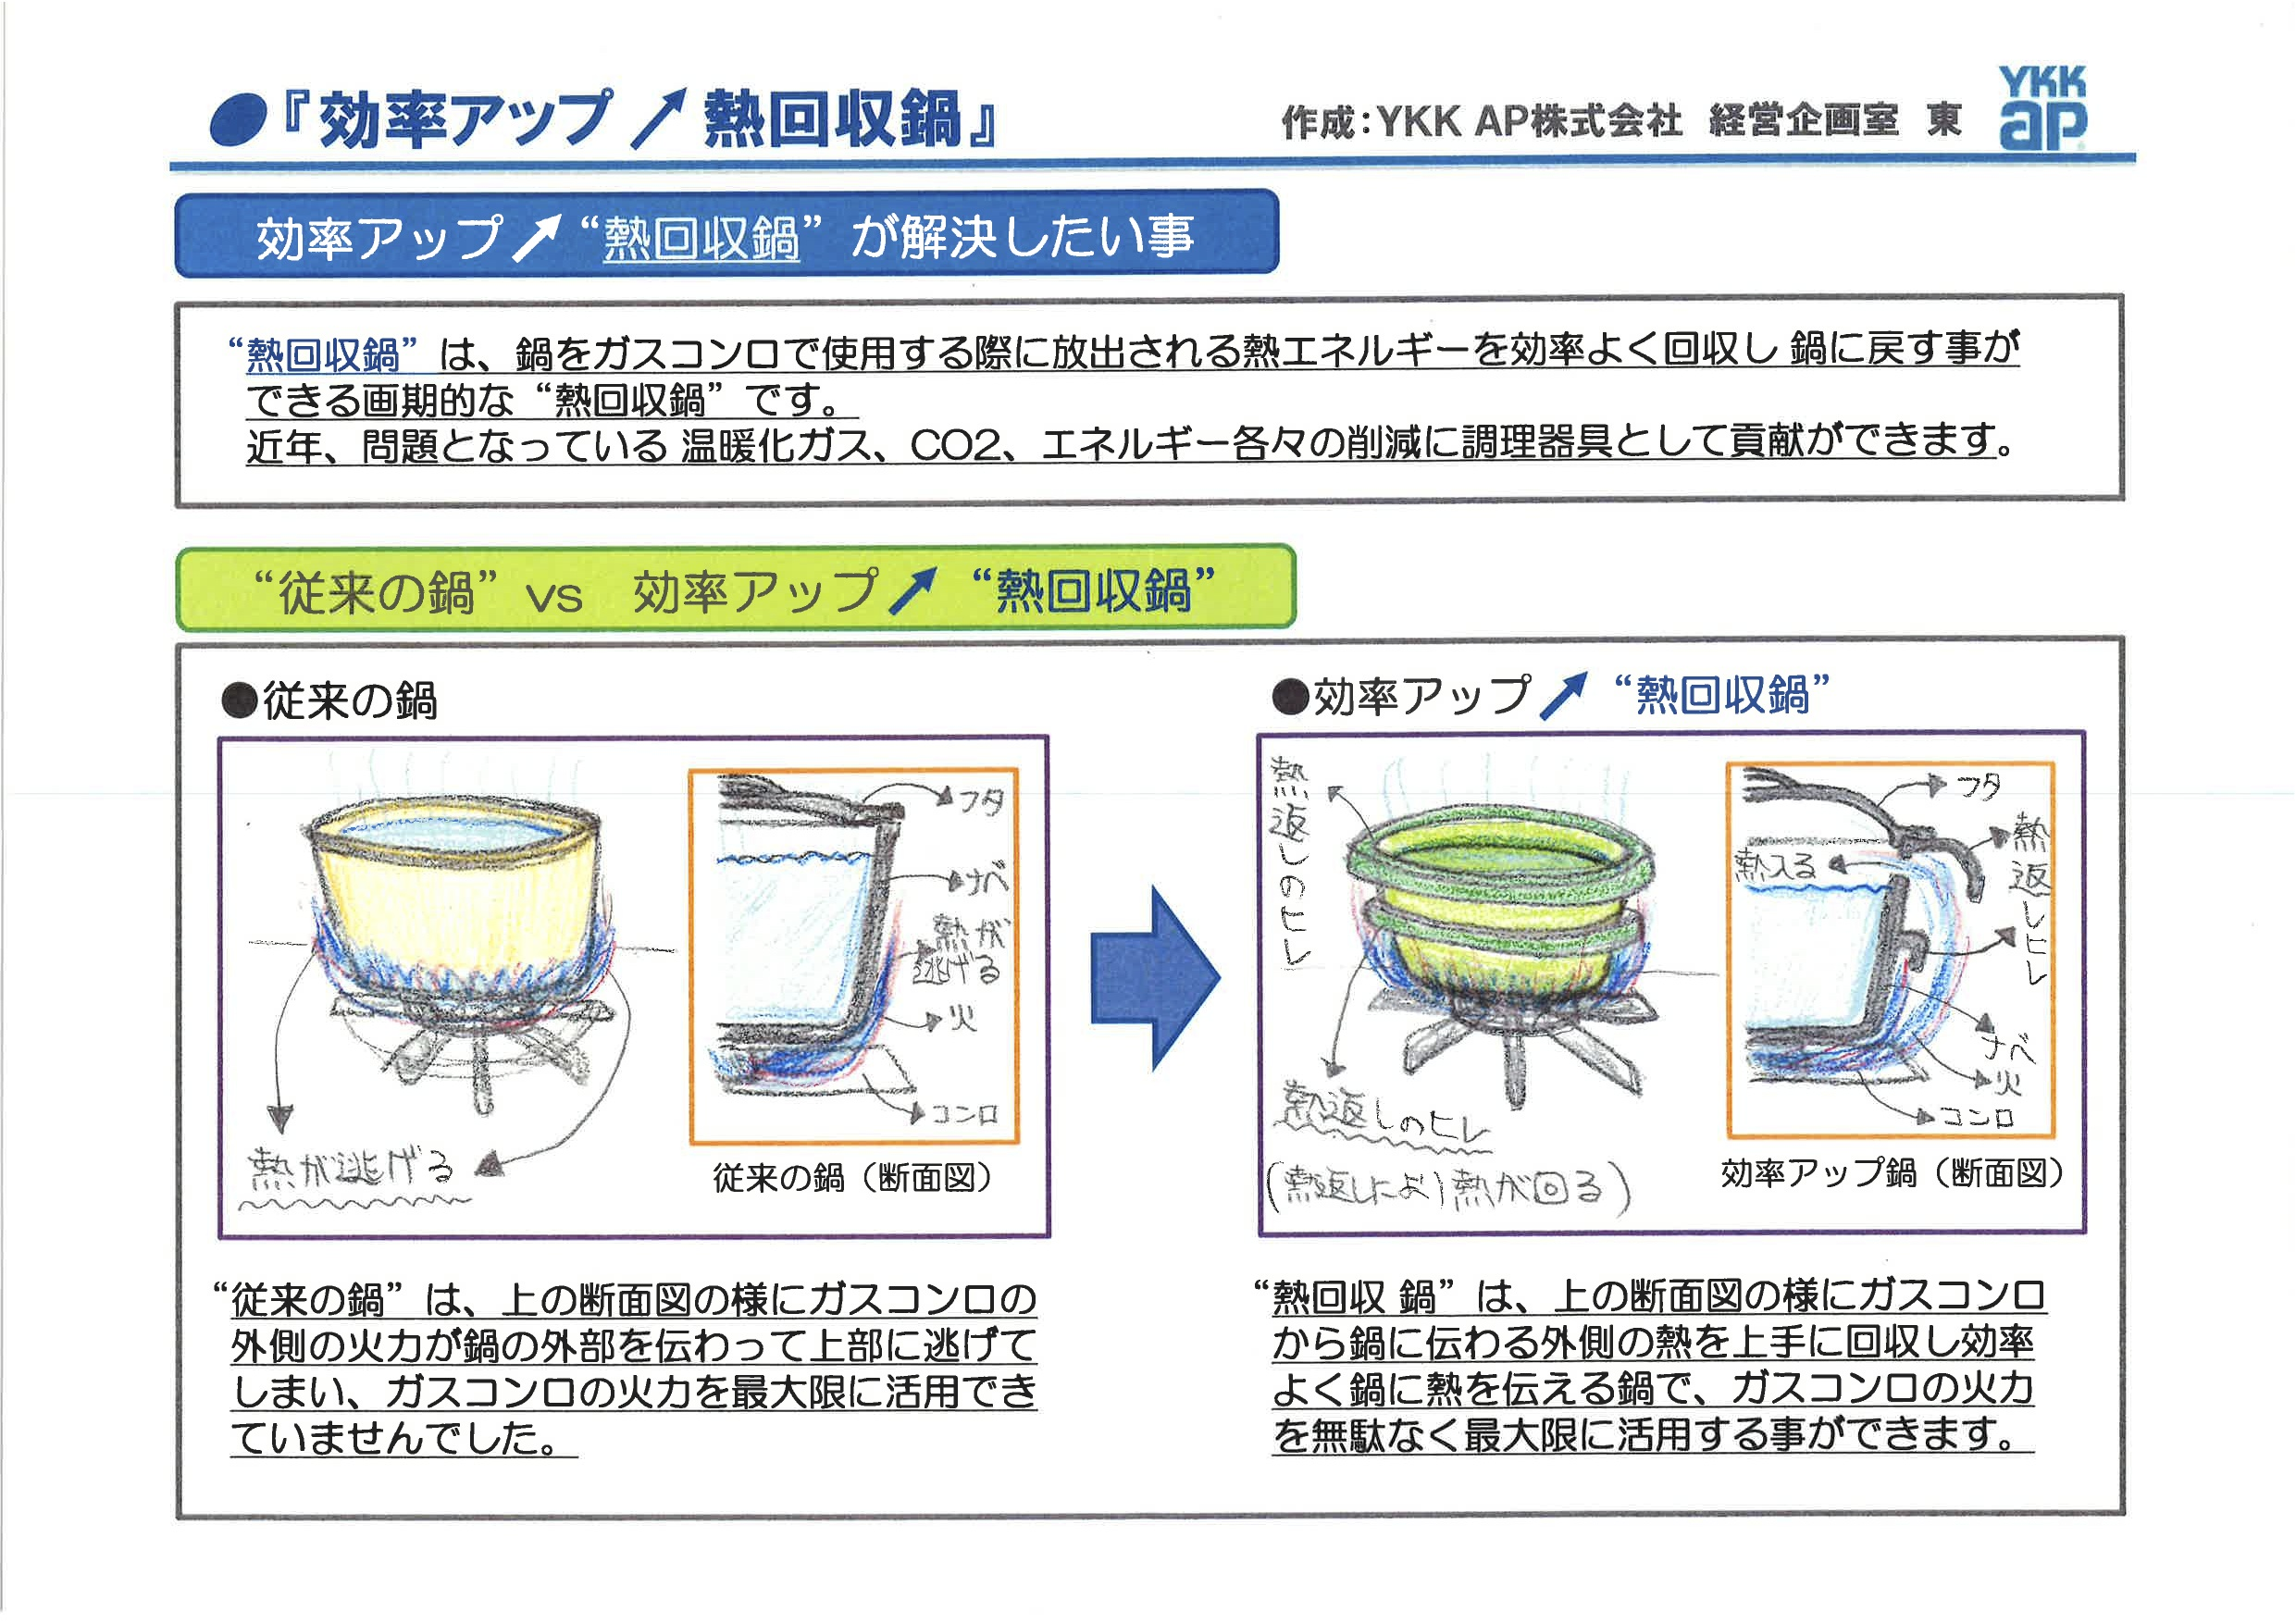 効率アップ↑熱回収鍋 東克紀